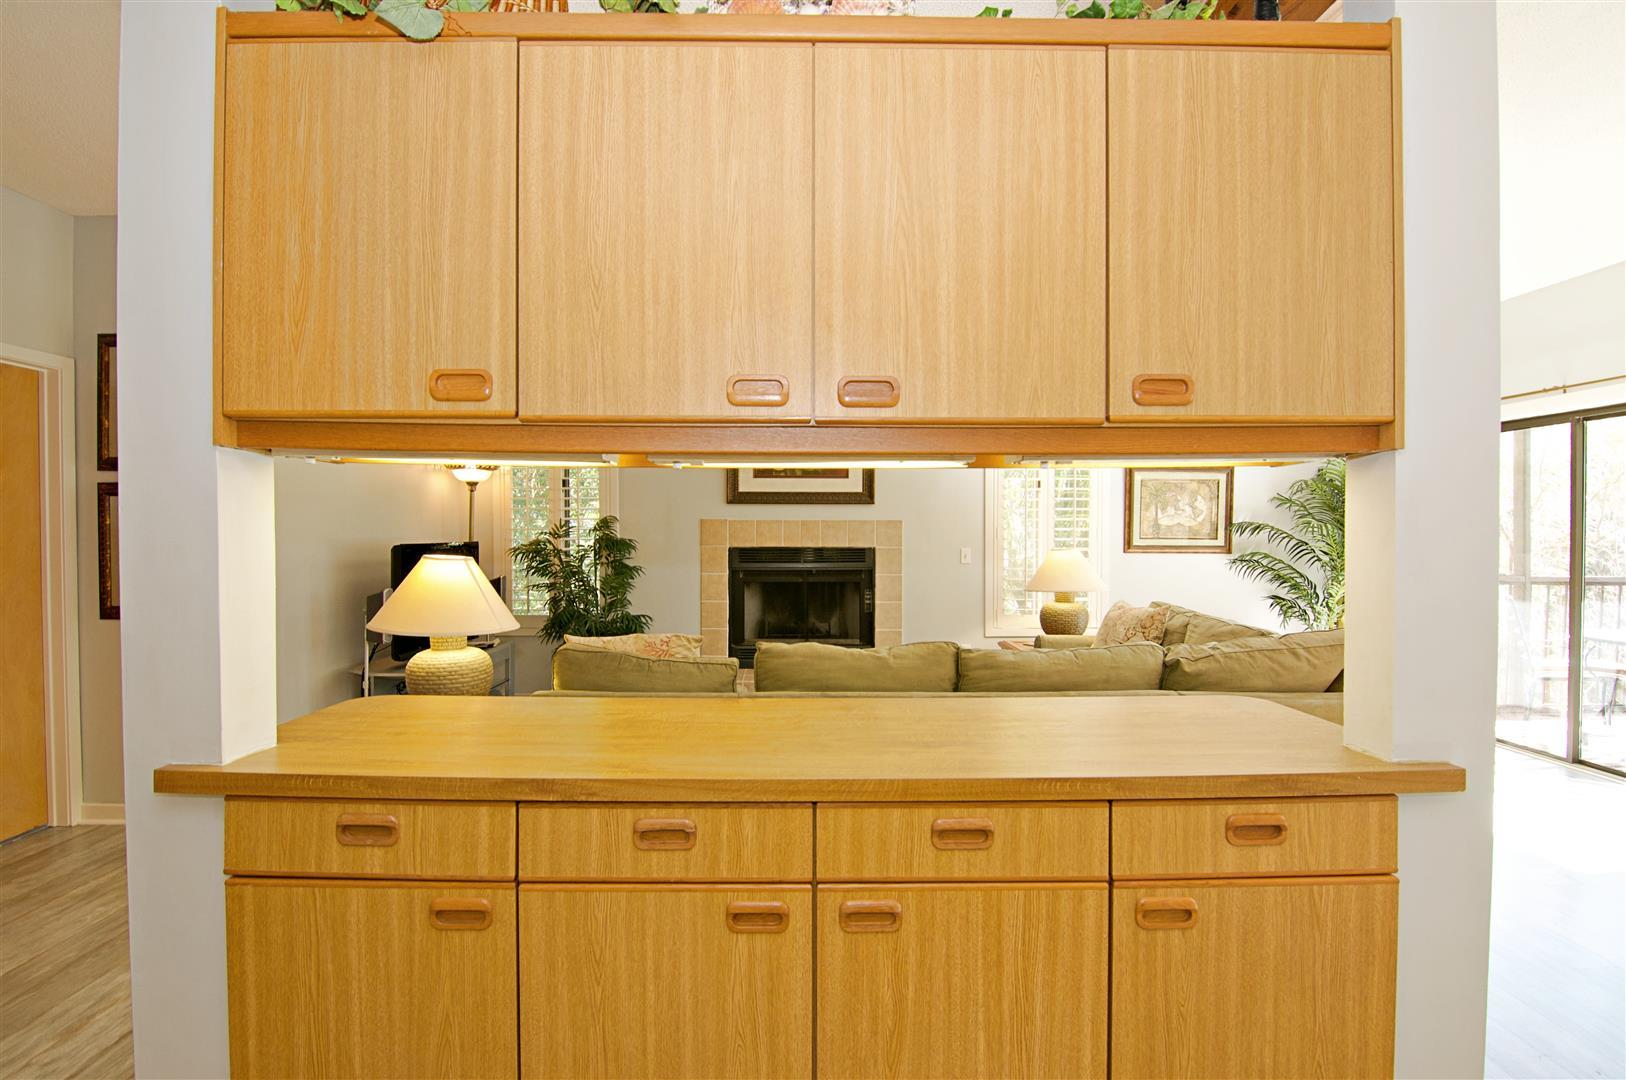 Seabrook Island Homes For Sale - 3020 Ocean Winds, Seabrook Island, SC - 38